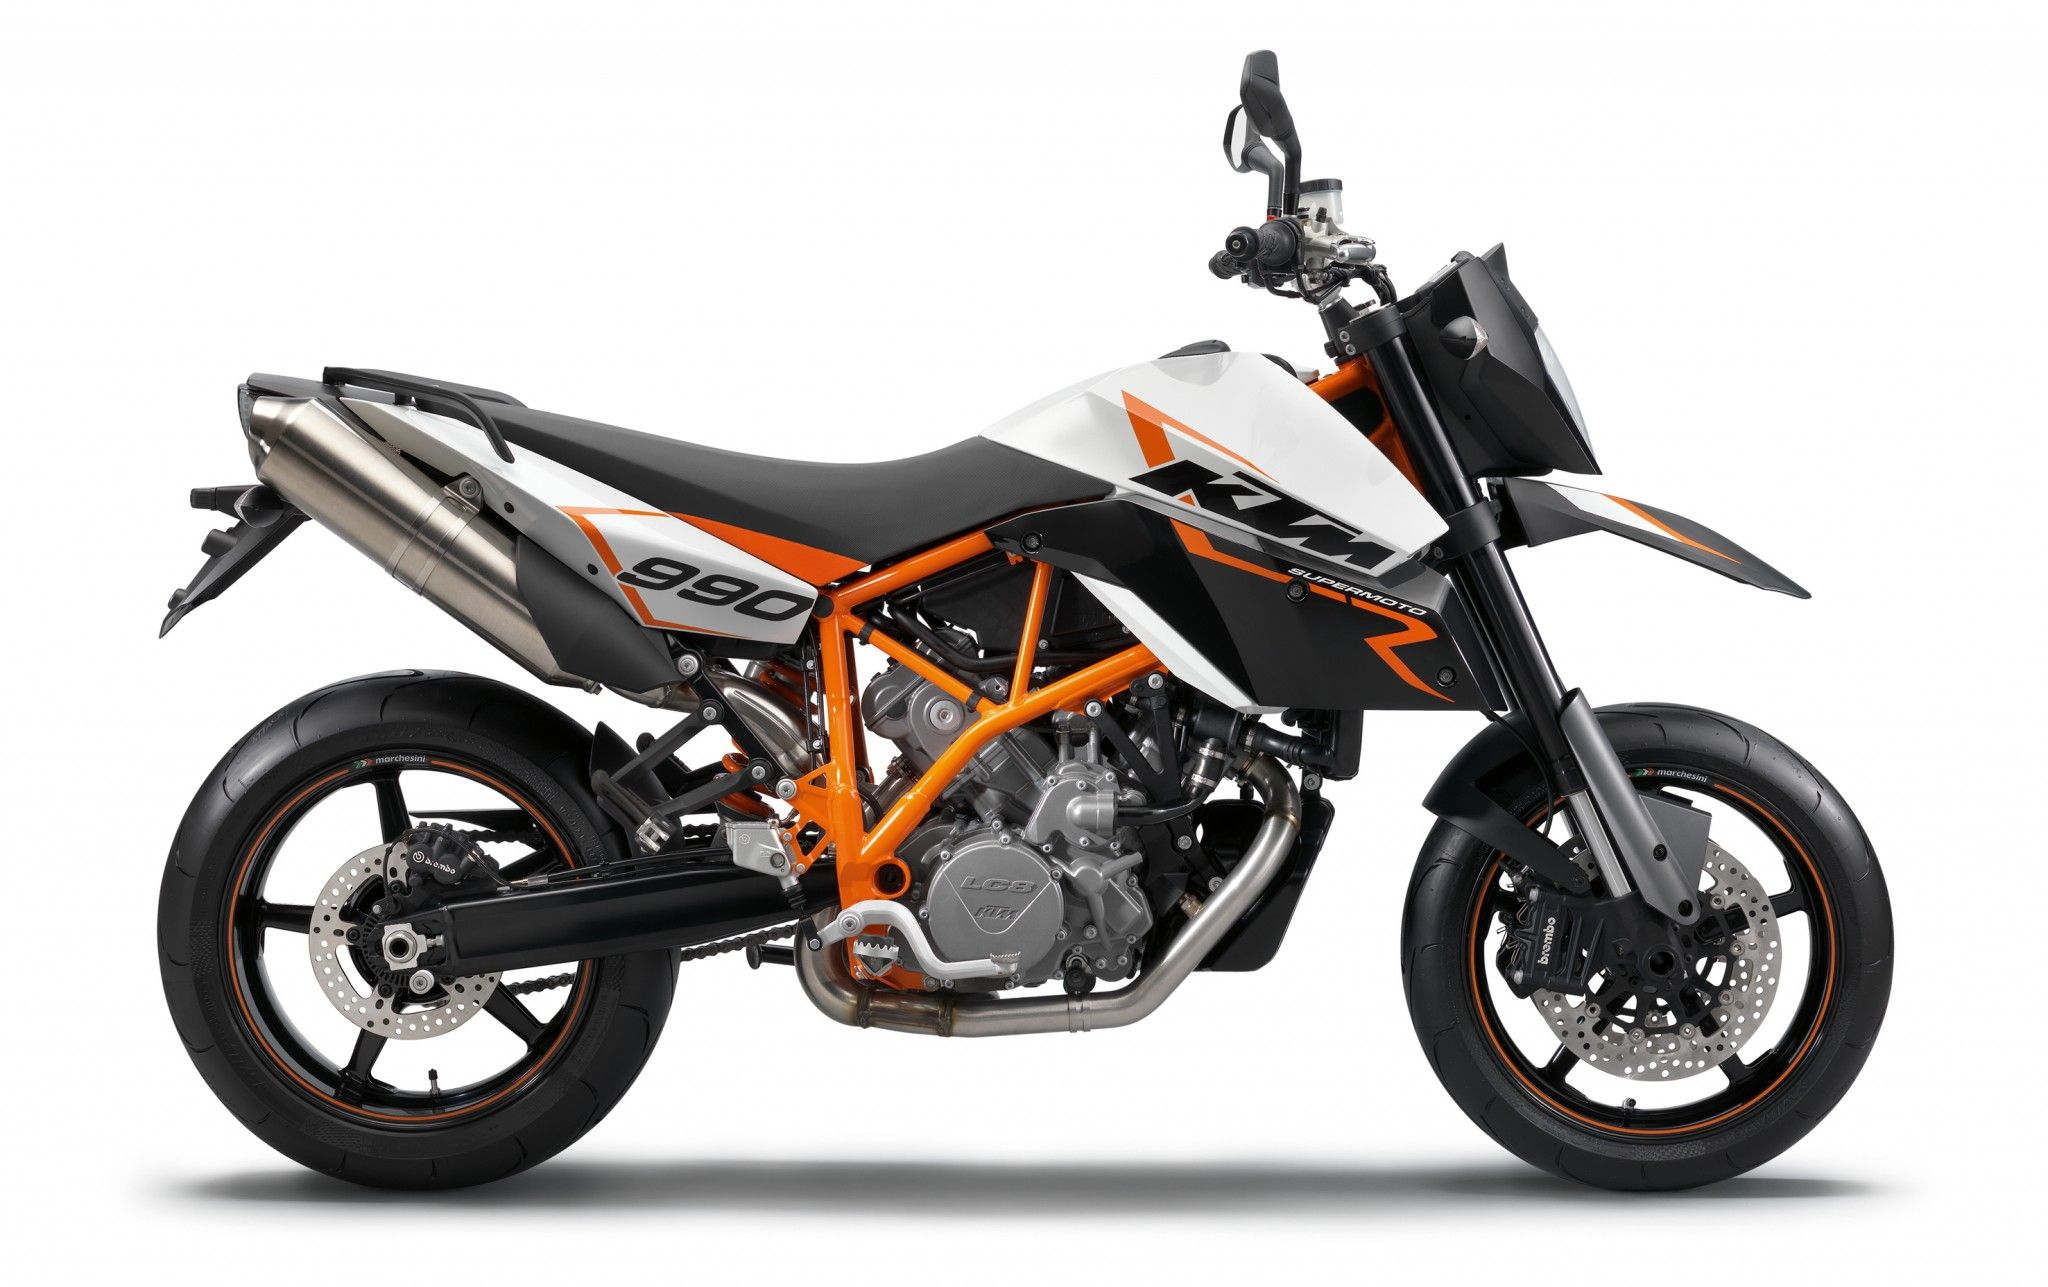 2012 KTM 990 Super Duke R motorcycle review @ Top Speed